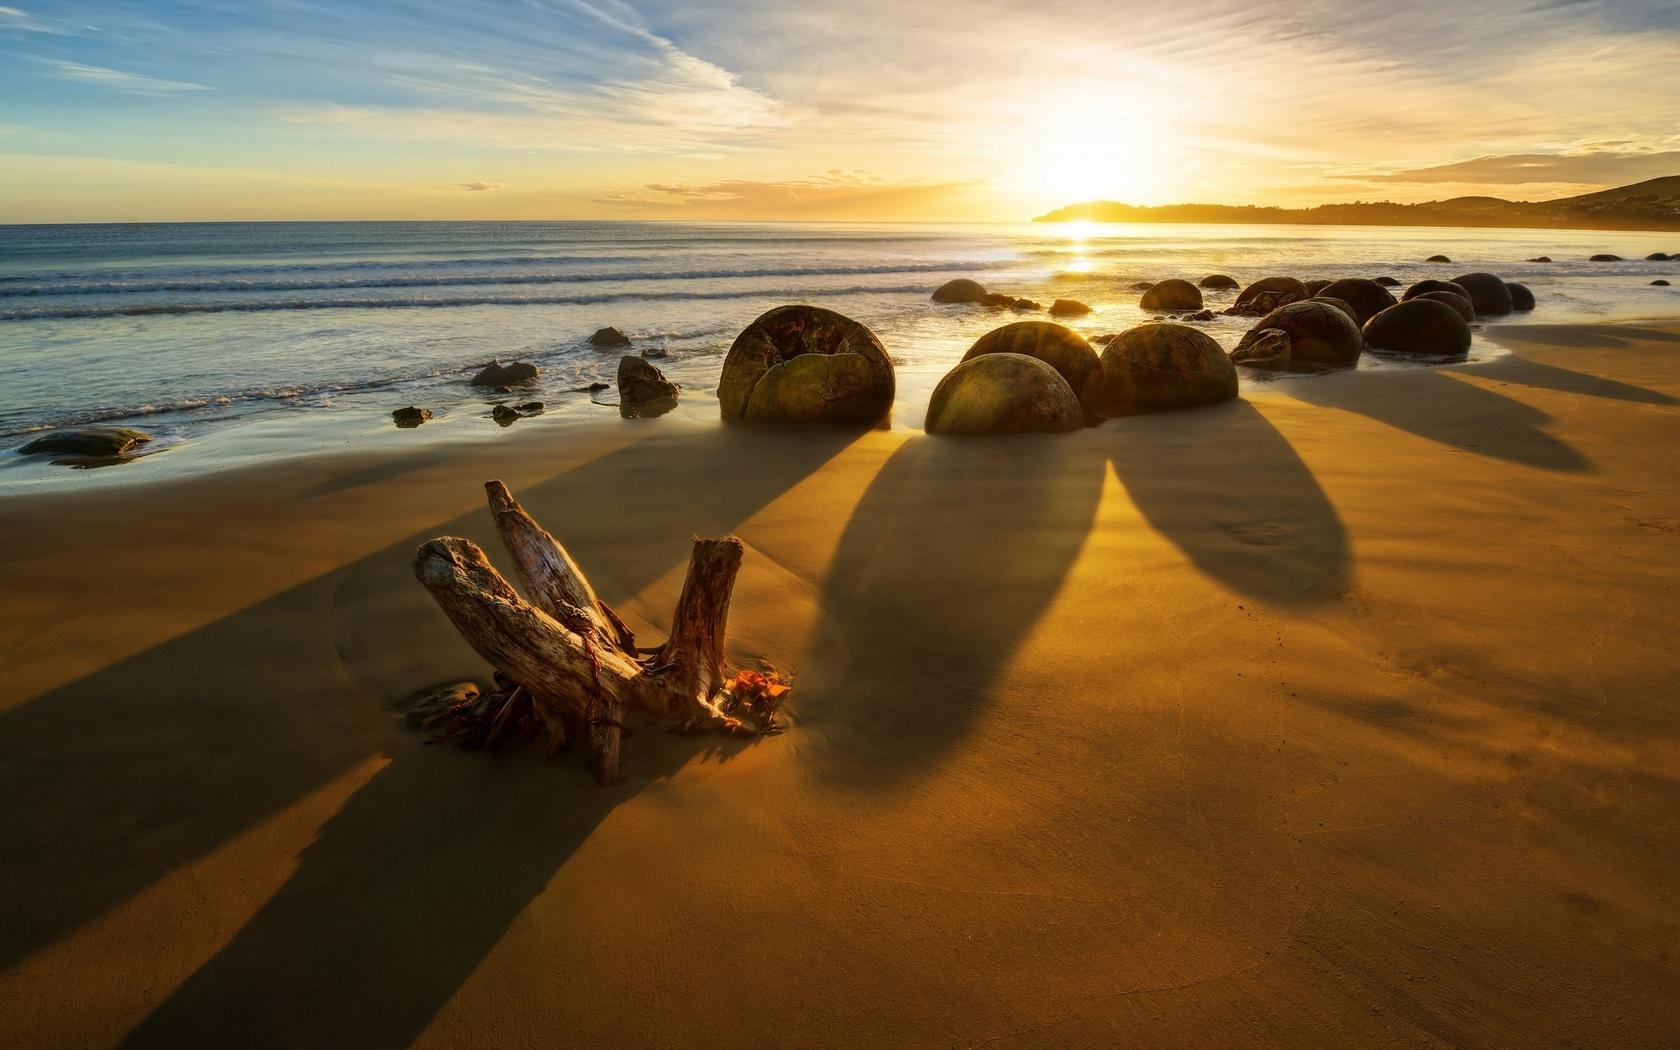 новая зеландия, море, камни, закат, скалы, пляж